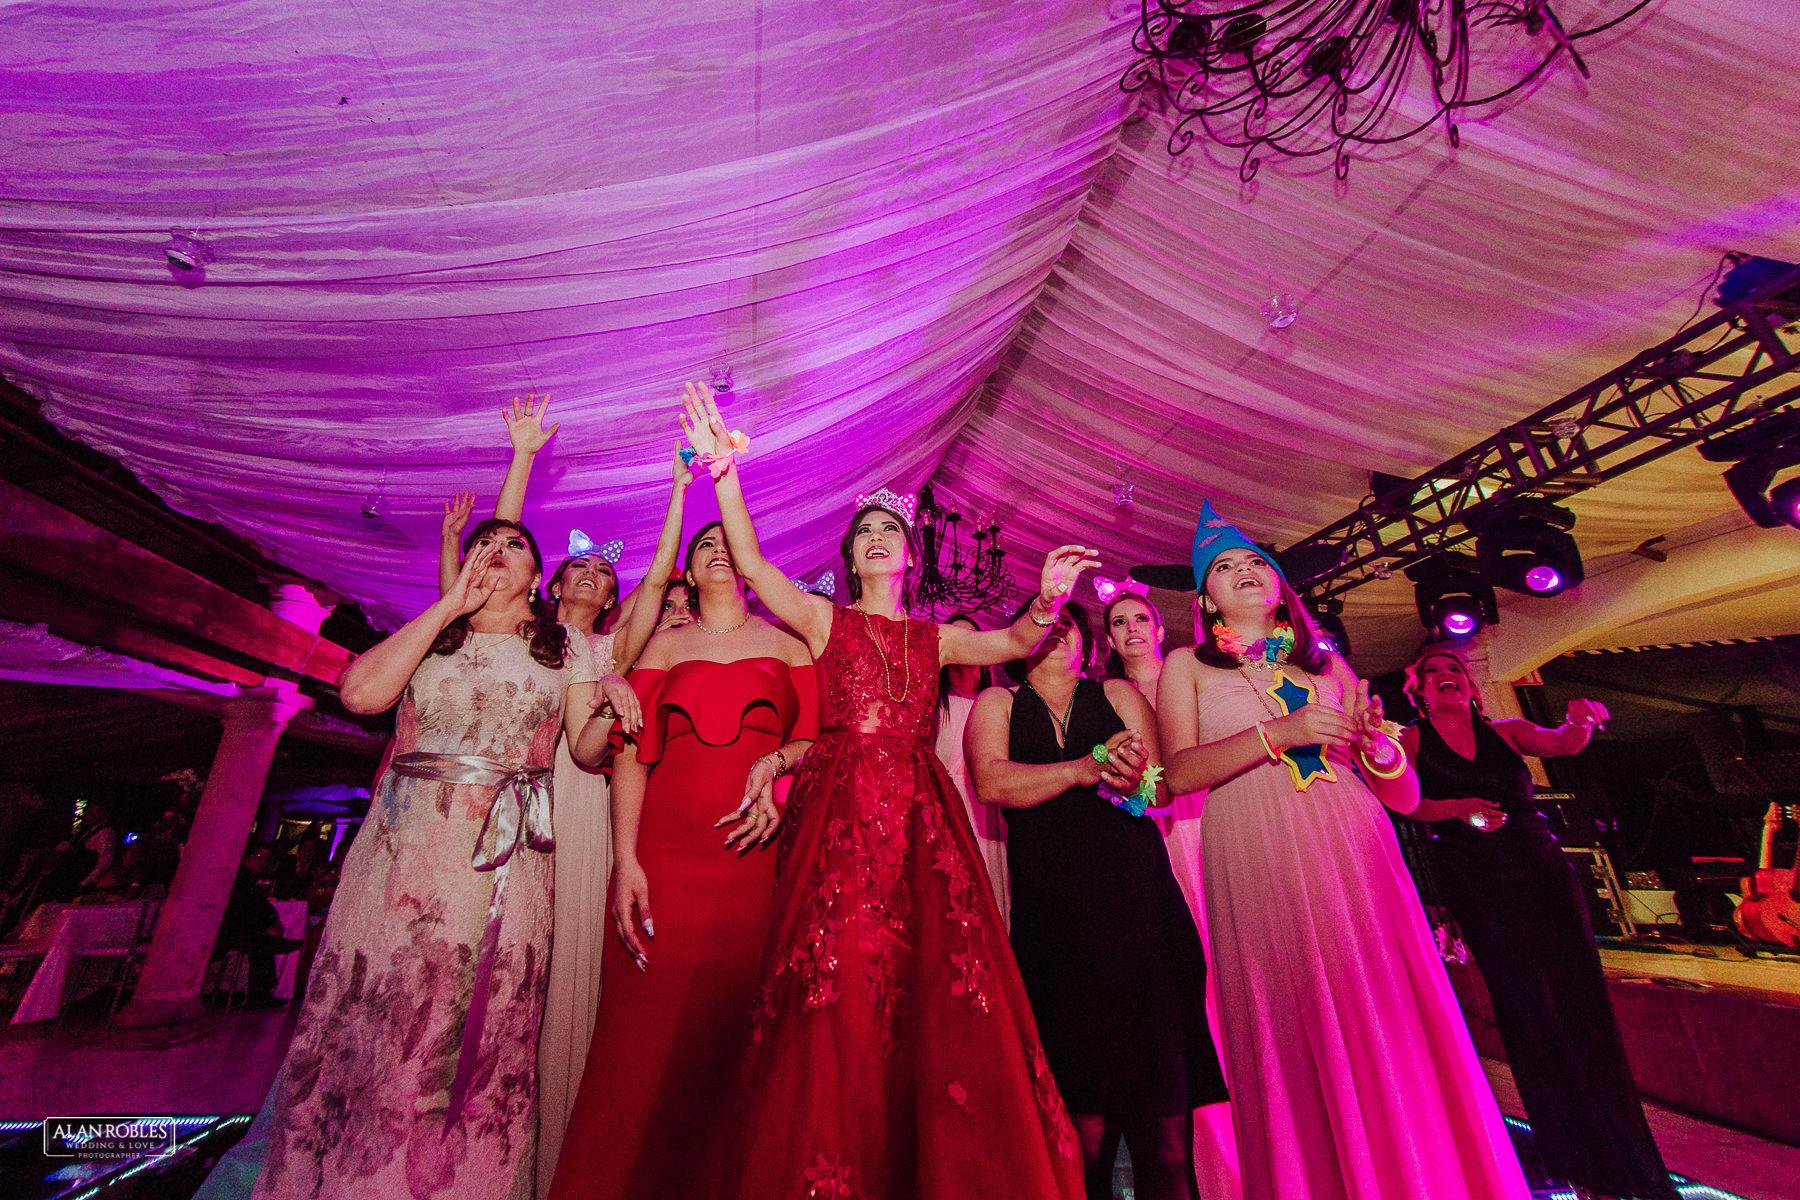 Alan Robles fotografo de bodas guadalajara - LyP Hotel Demetria-76